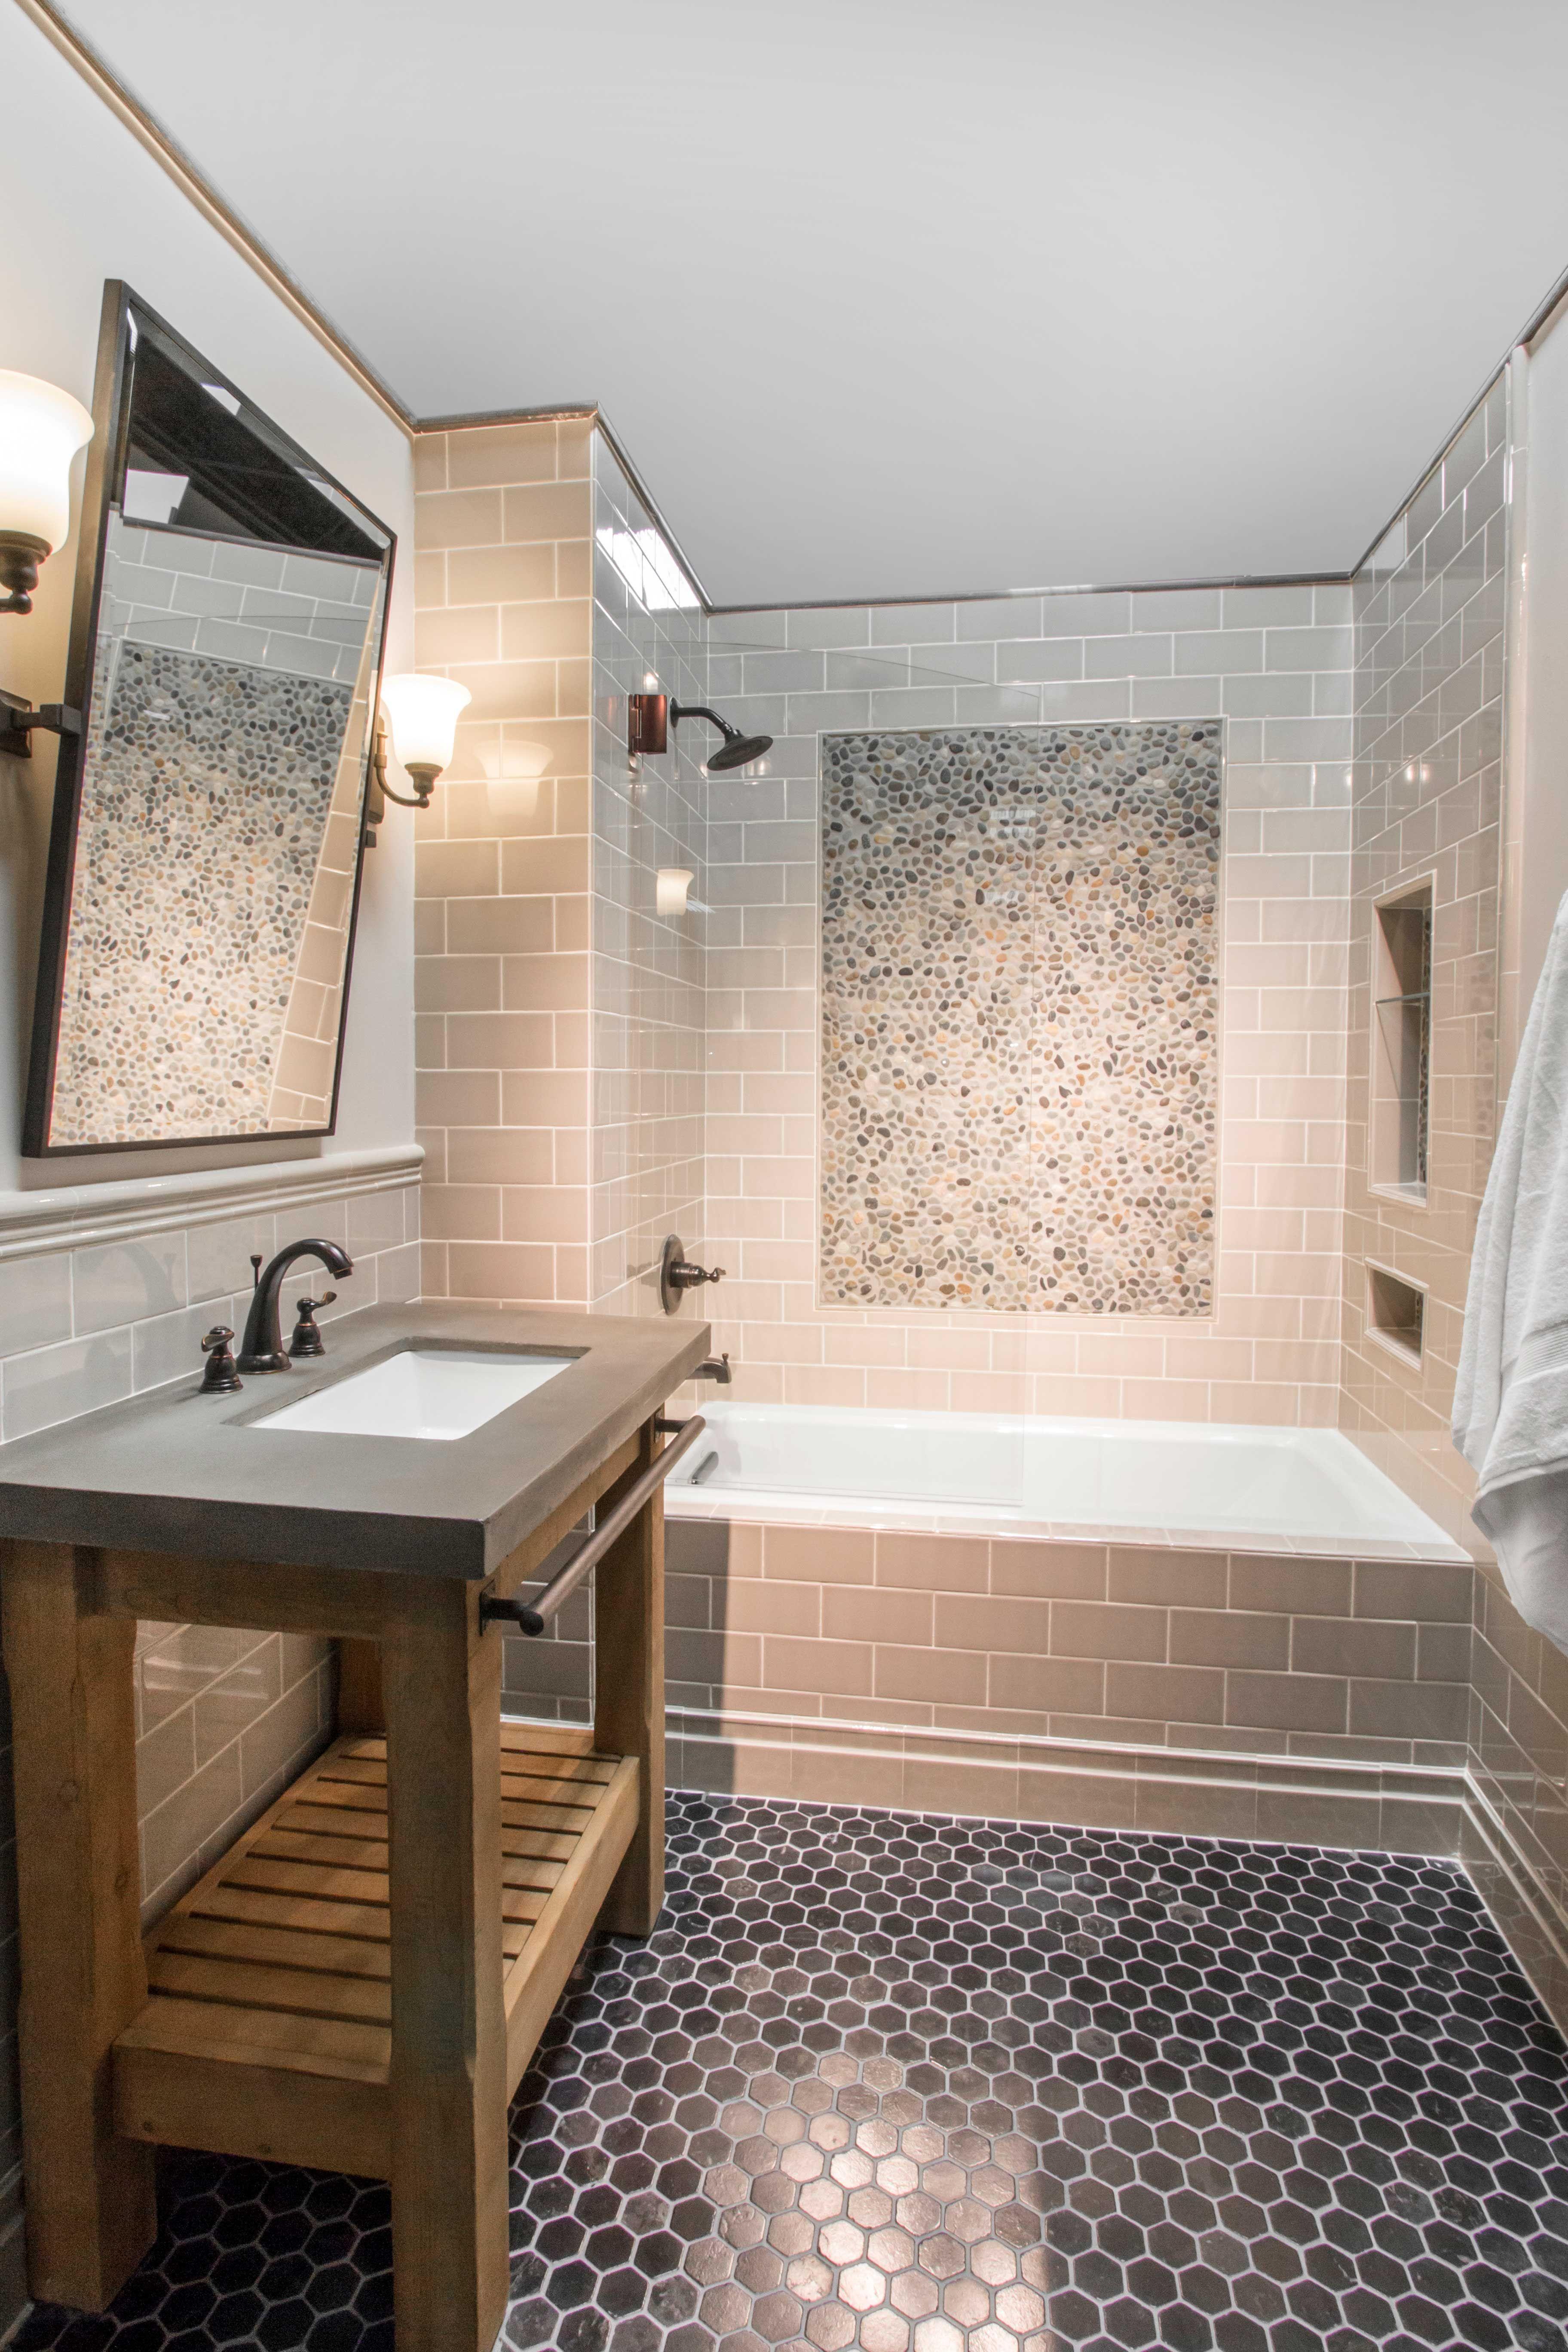 Travertine Bathroom Floor black bathroom floor tile - noir hex travertine mosaic tile https